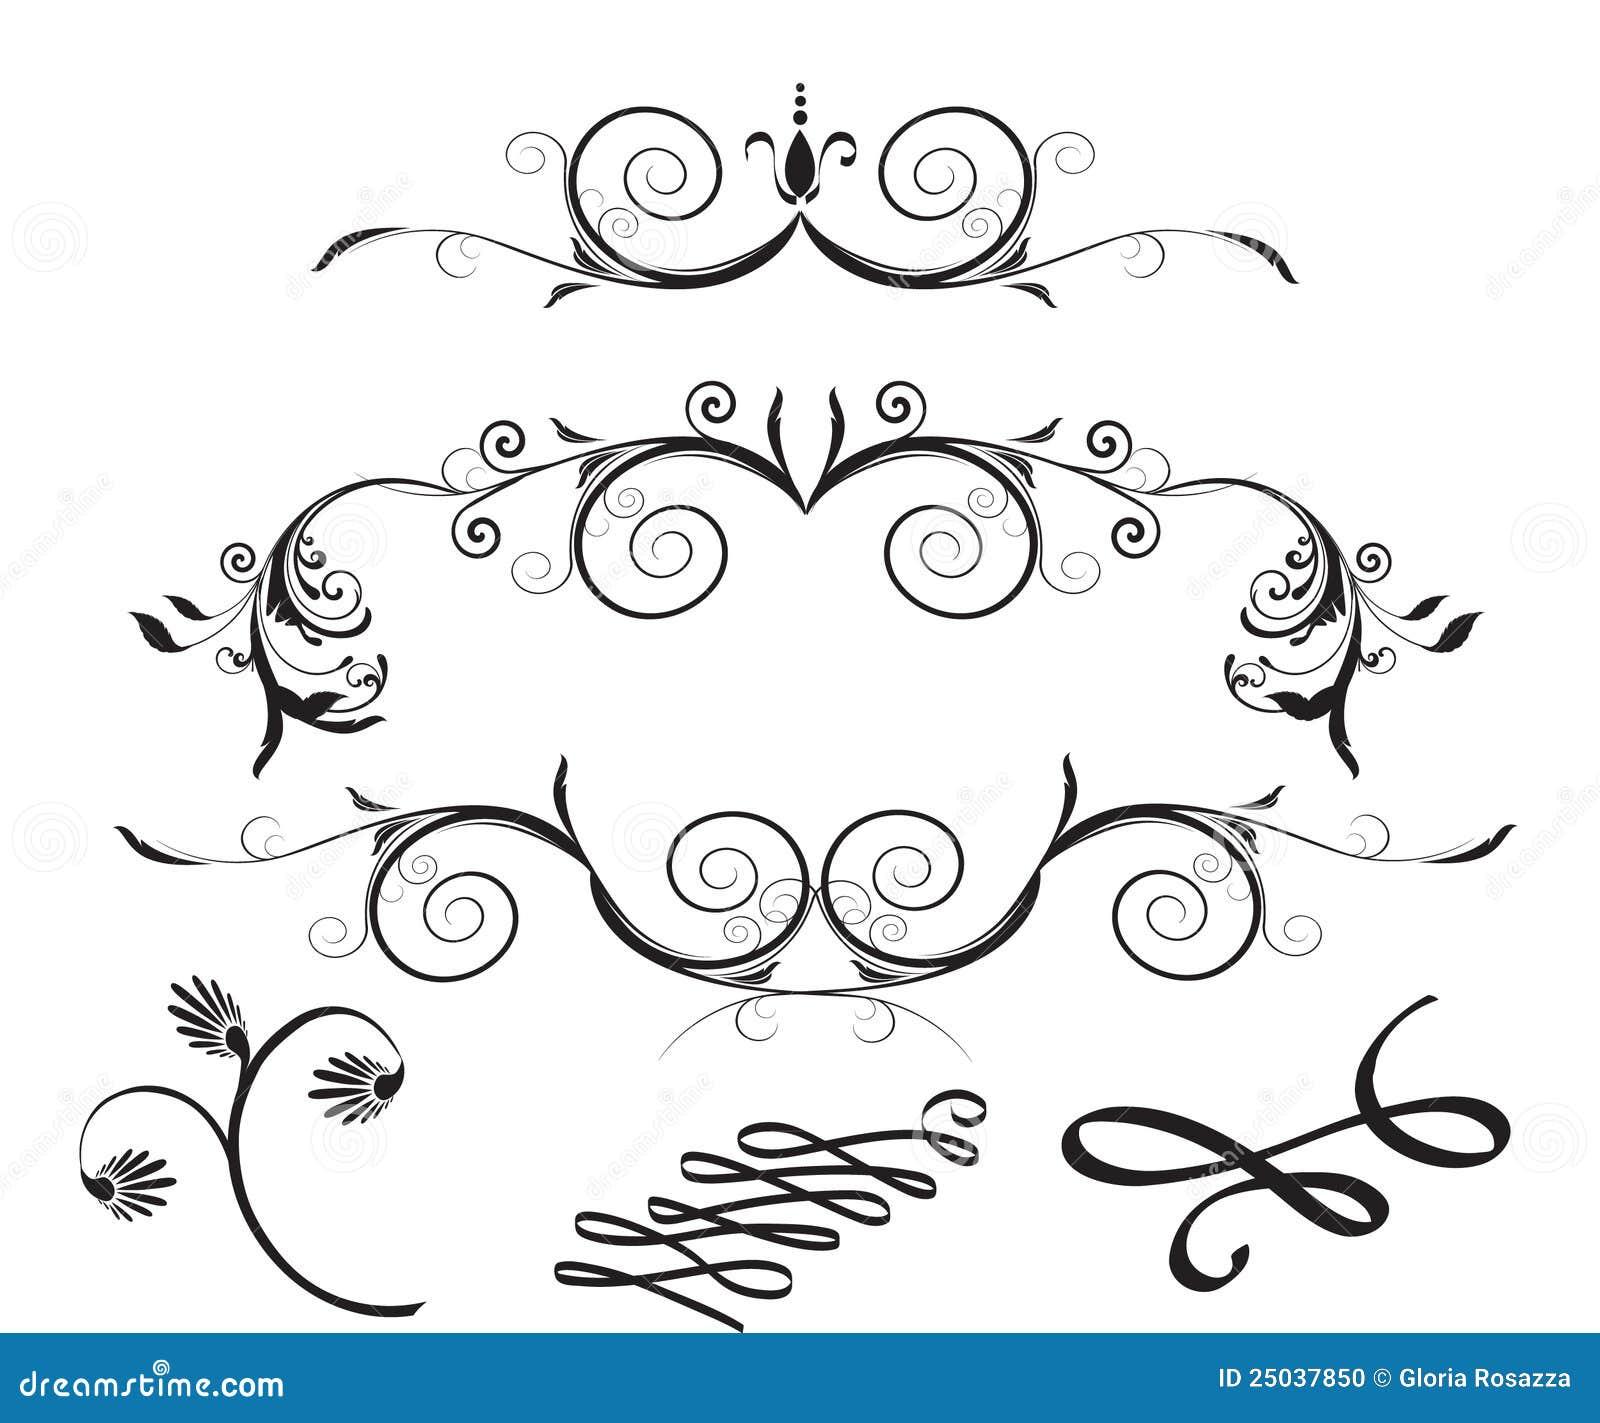 Decorative floral design elements stock photo image for Decoration elements